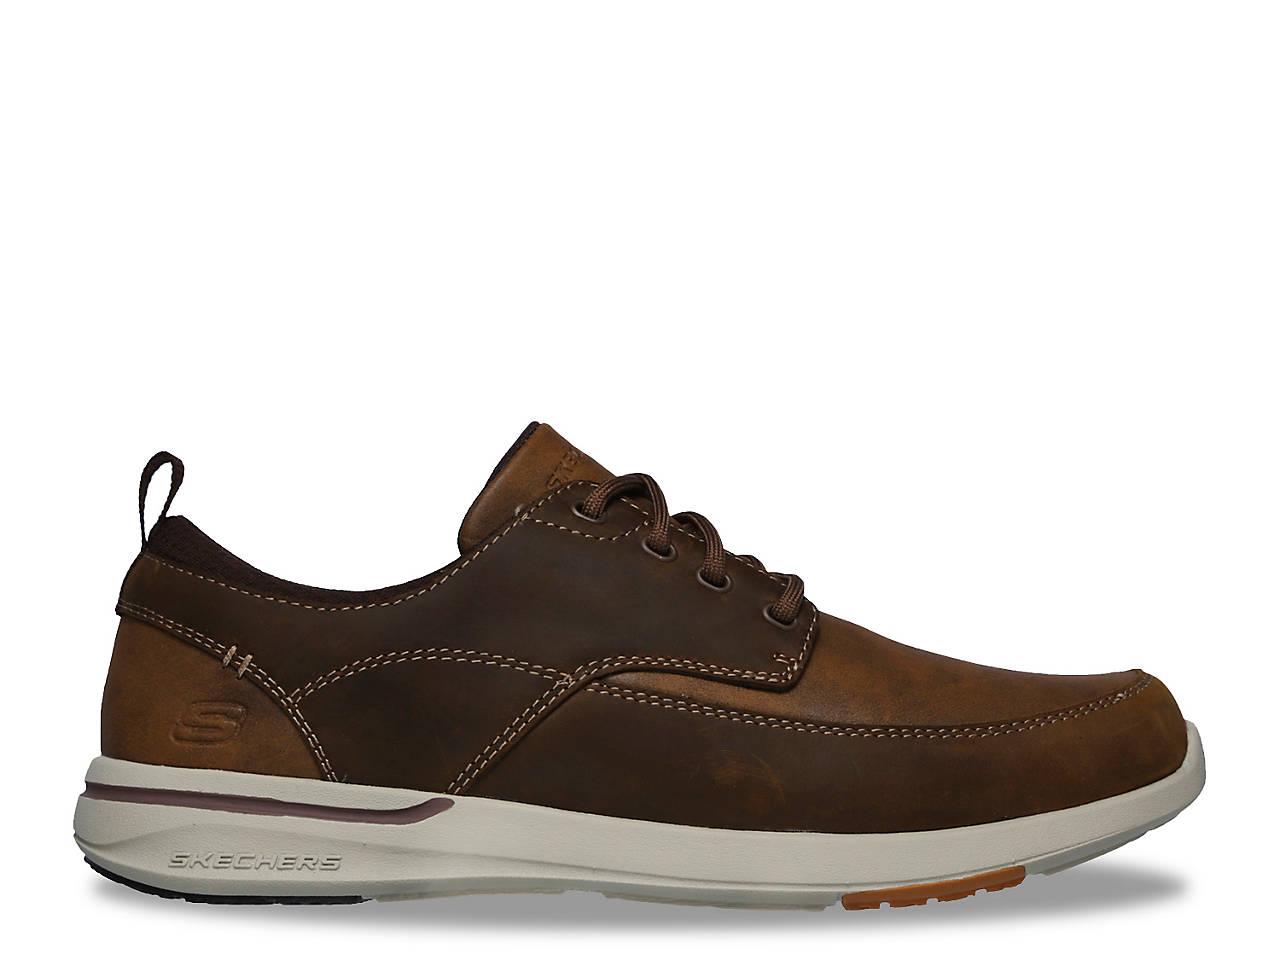 Skechers Relaxed Fit Elent Leven Oxford Men's Shoes DSW  DSW